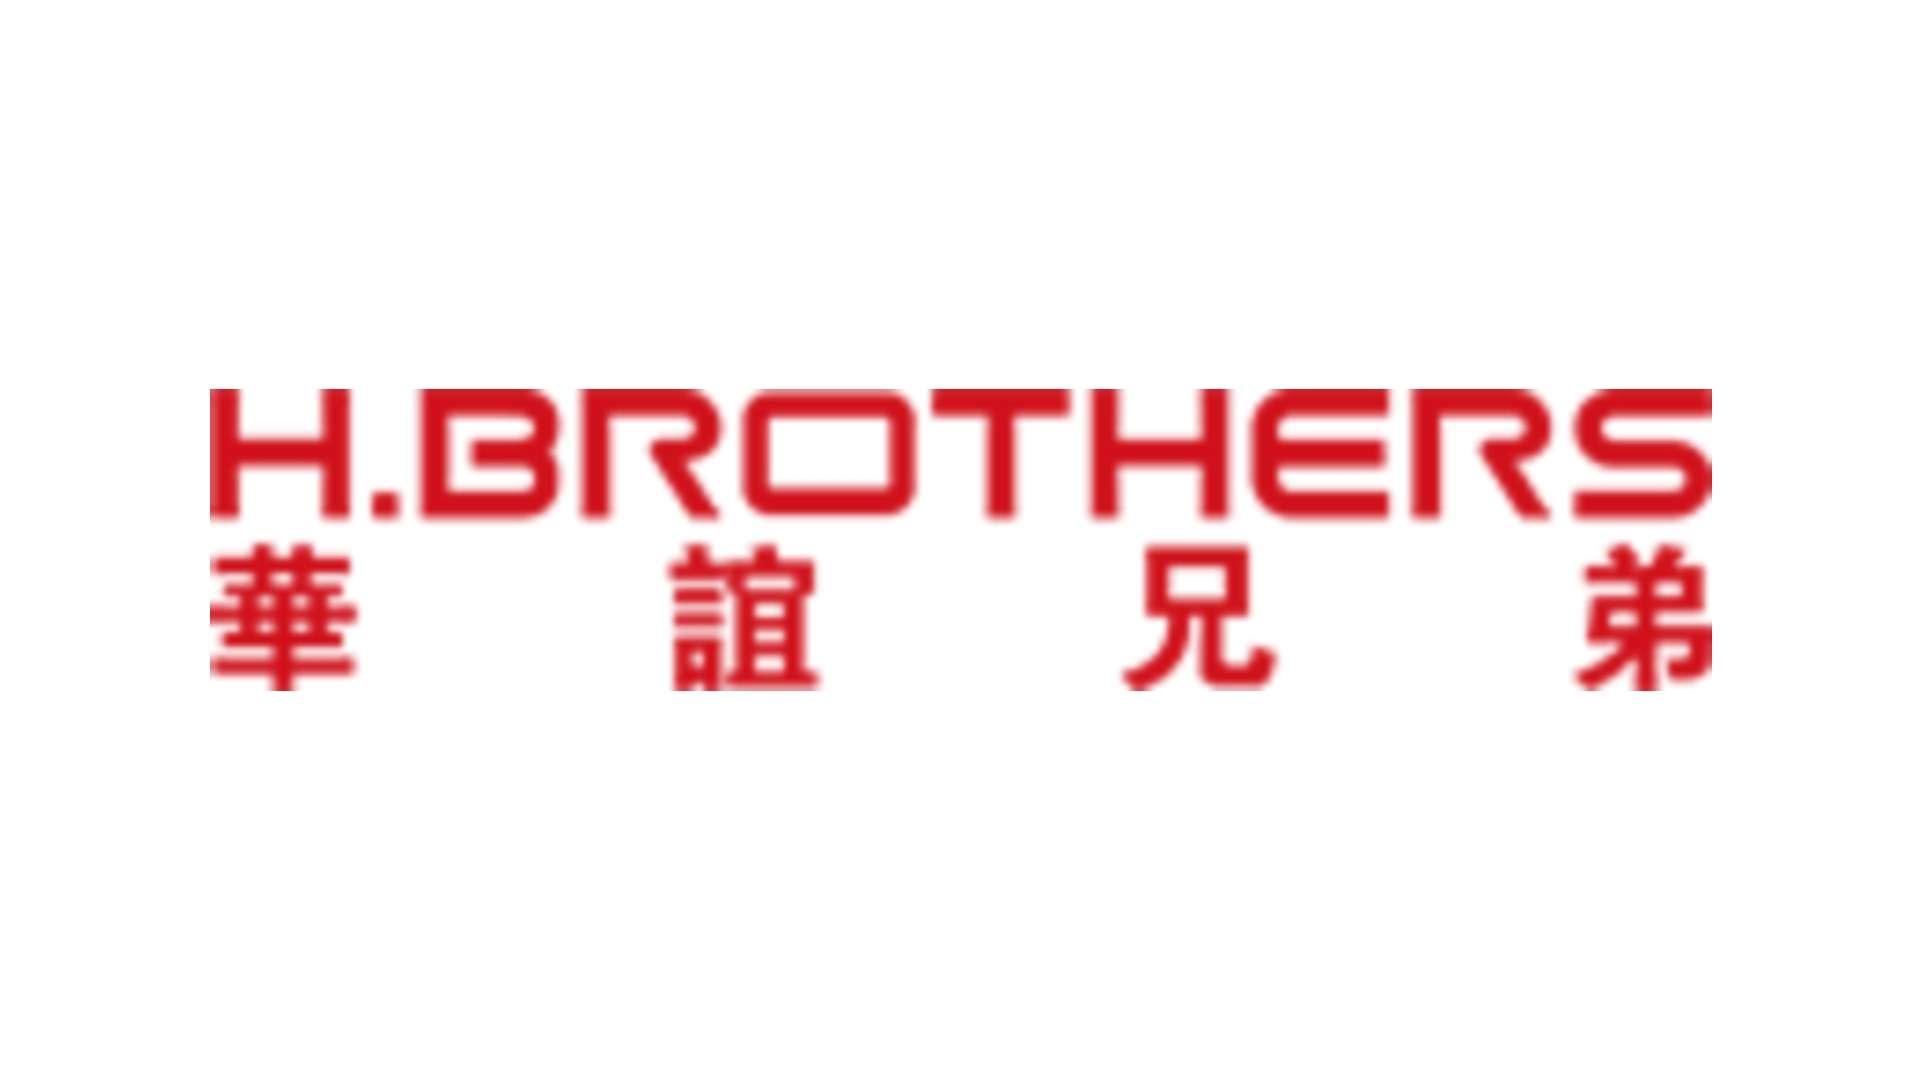 huayi brothers agency logo